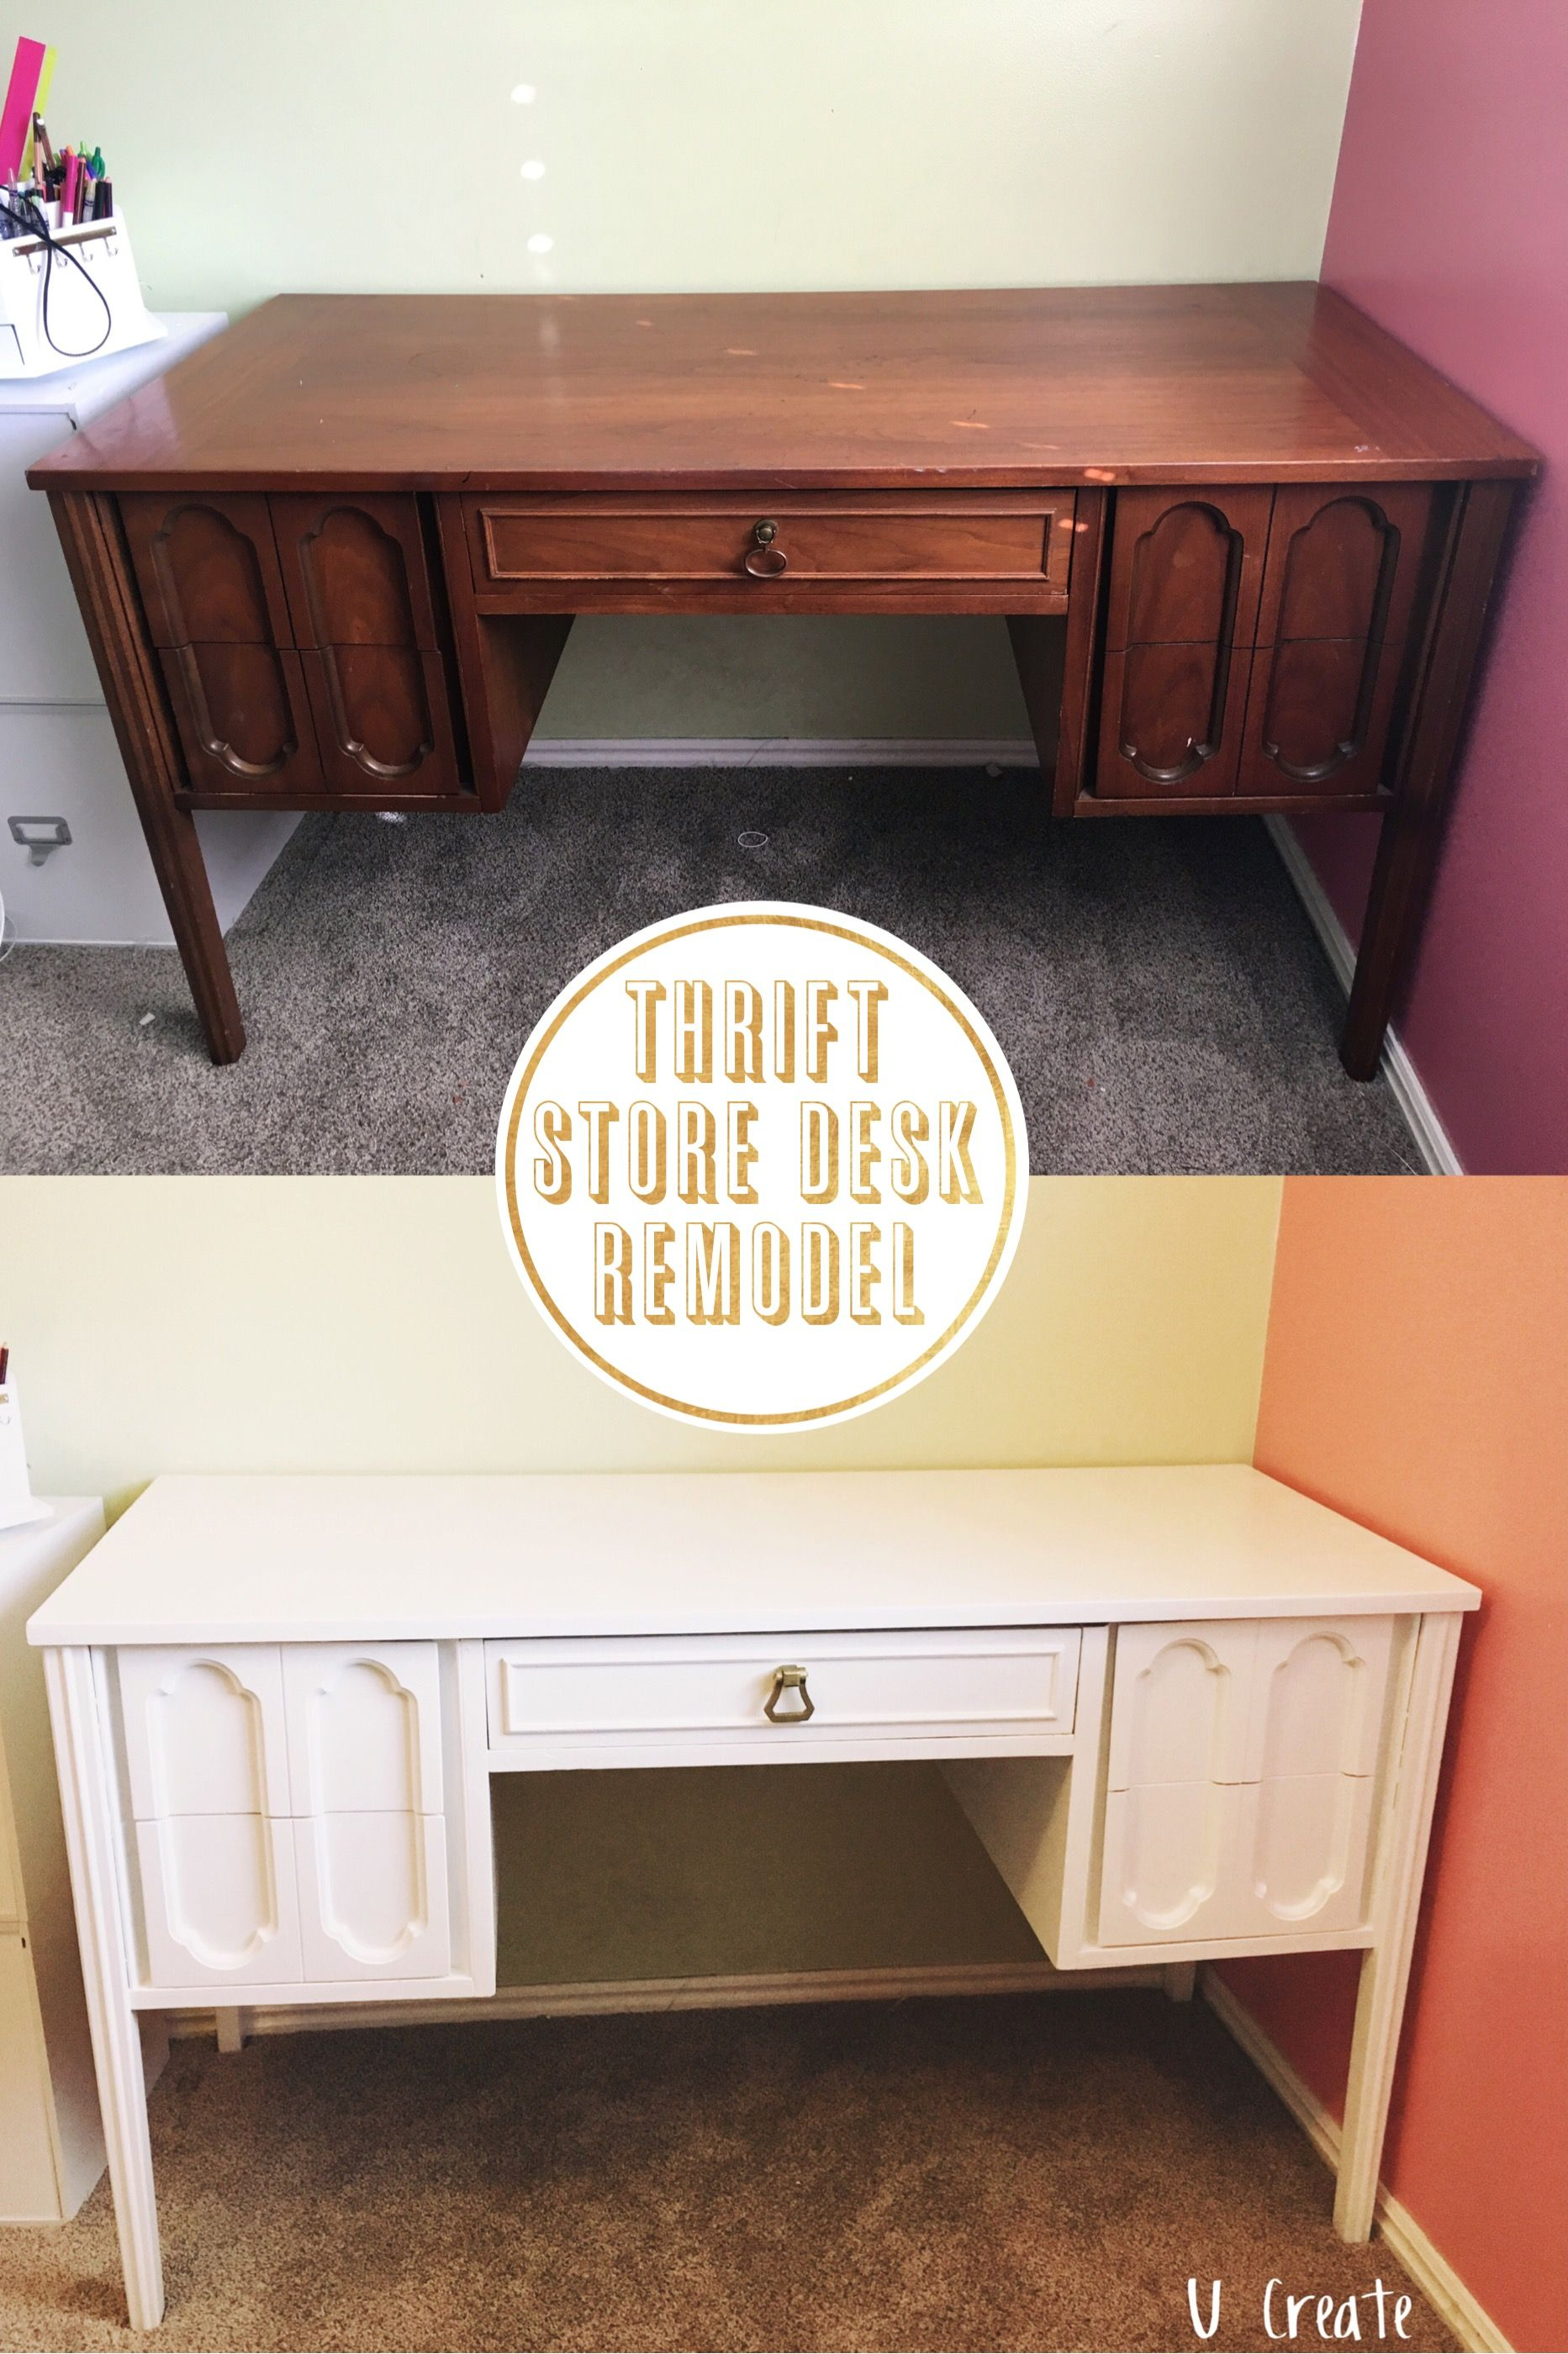 Thrift store desk remodel no sanding no priming with enamel paint diy furniture